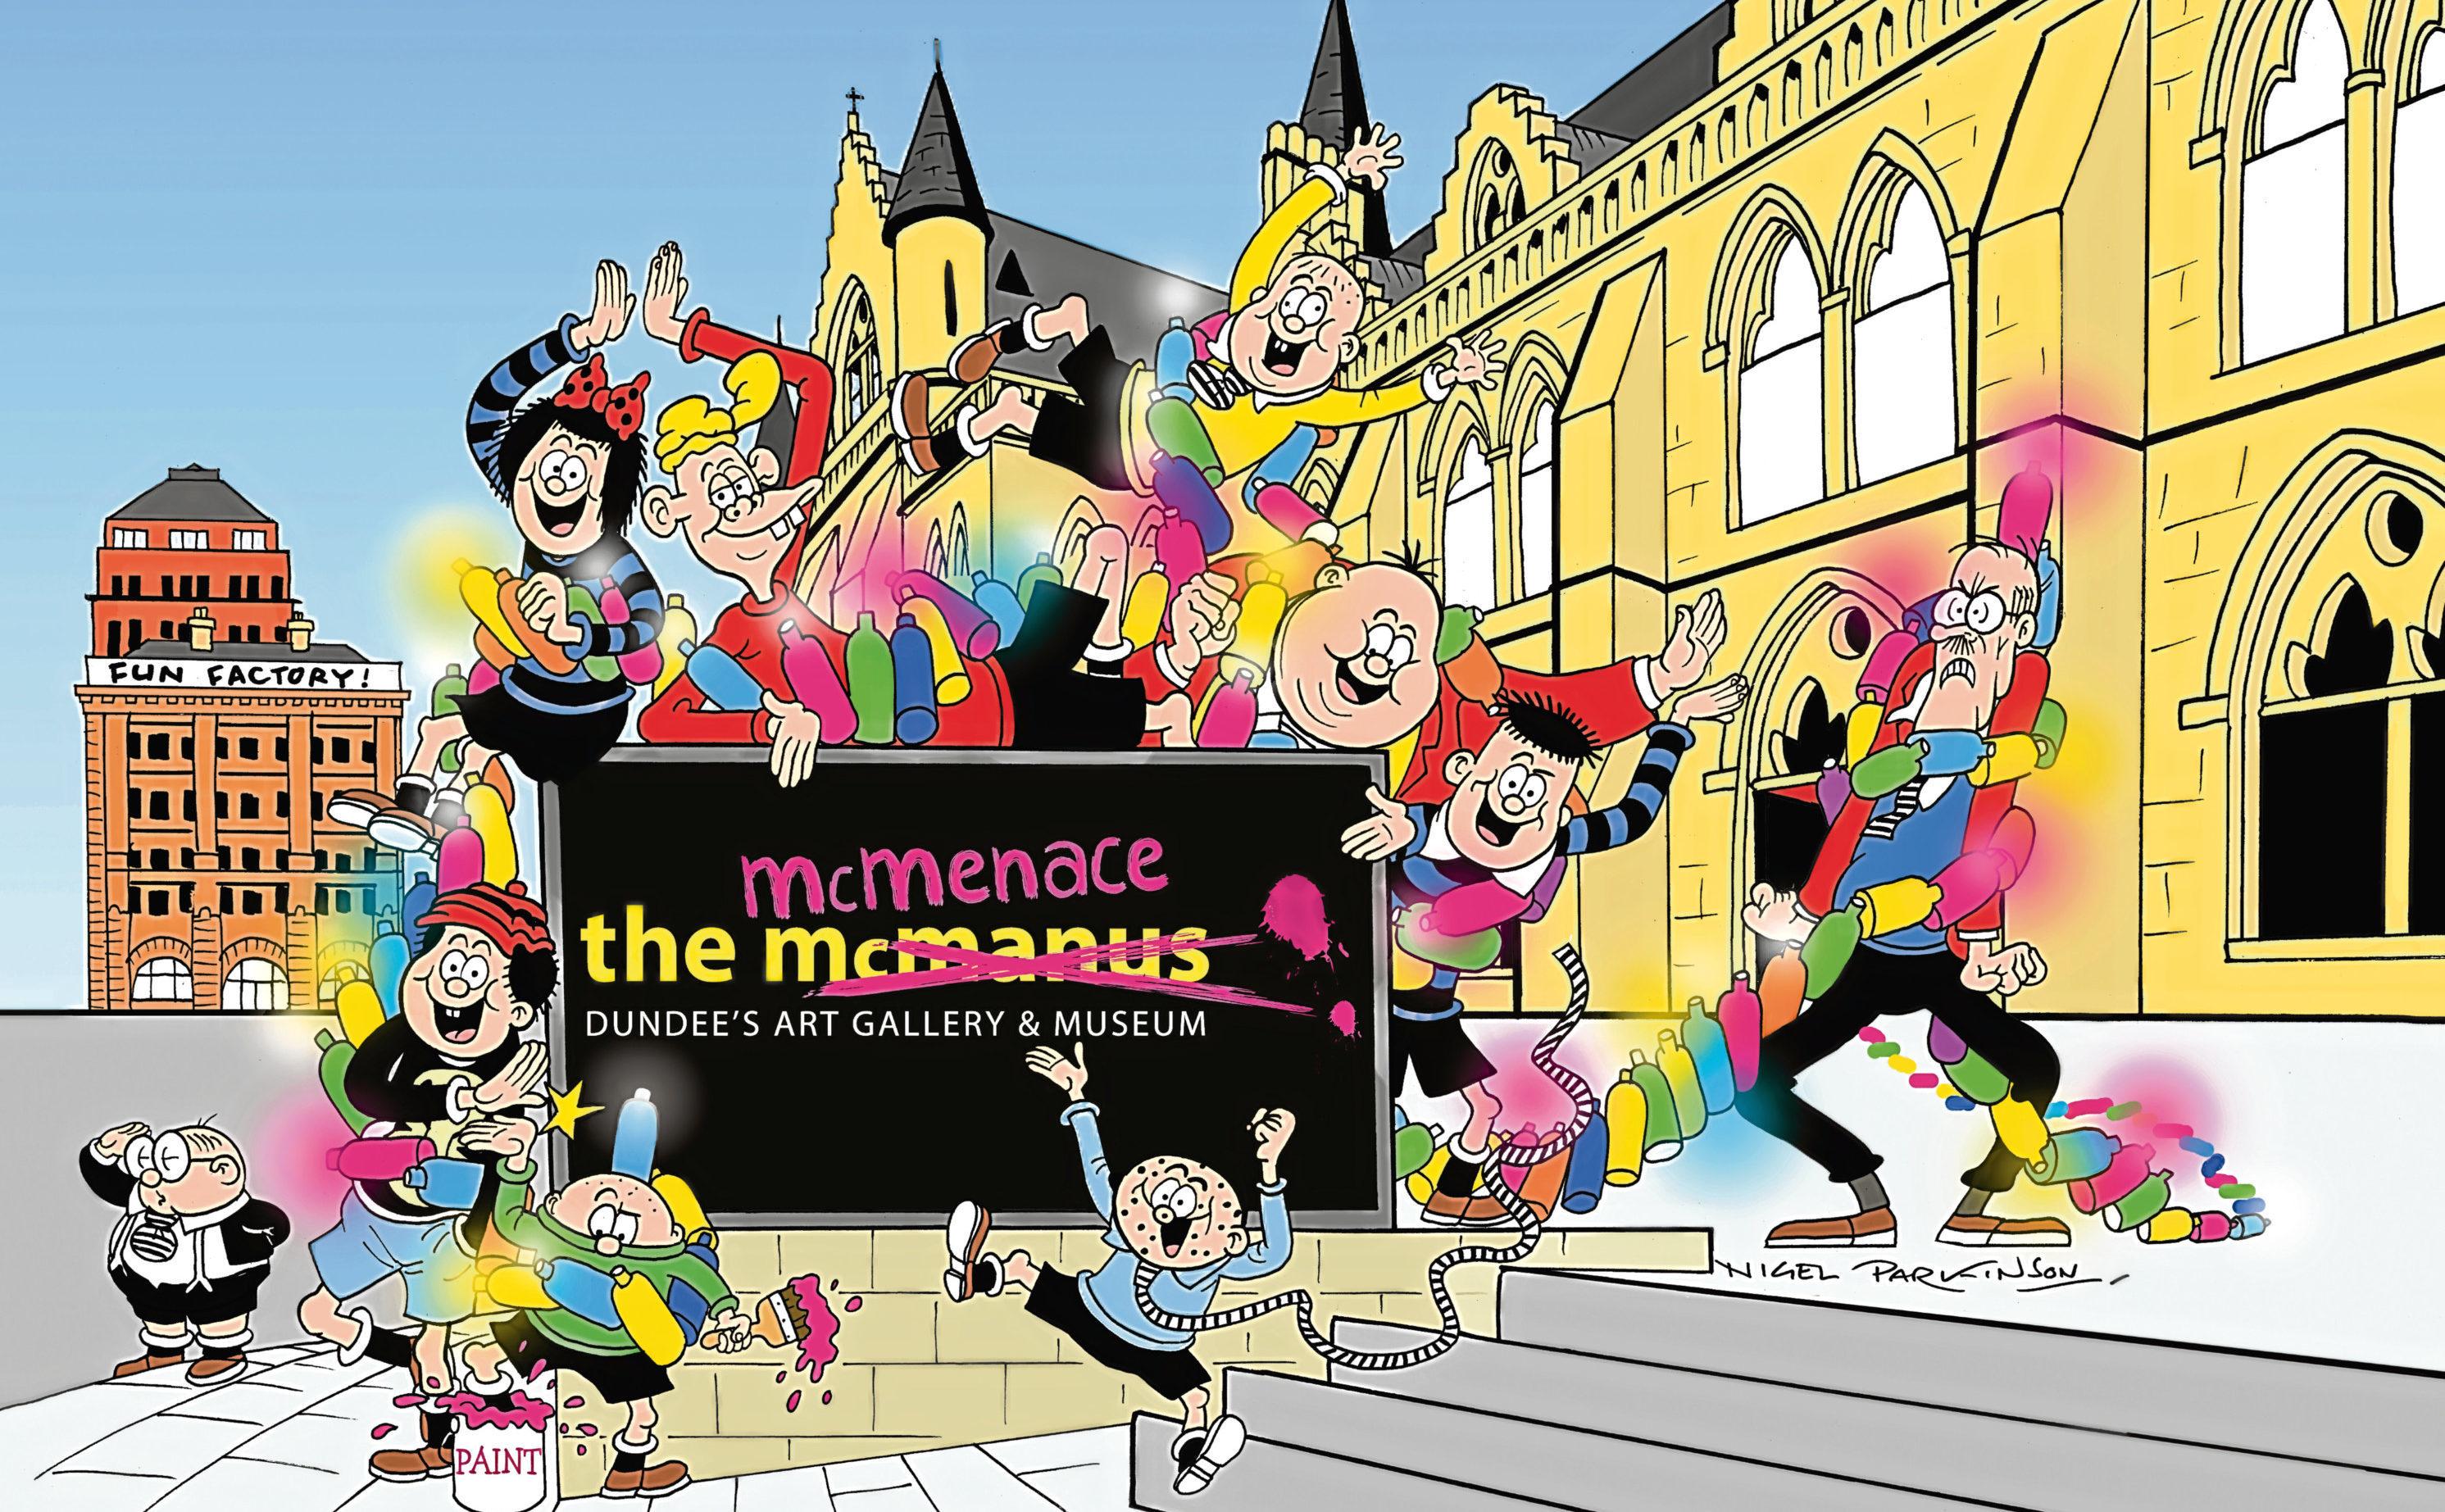 Beano comic illustrator Nigel Parkinson created an original comic strip starring The Bash Street Kids.